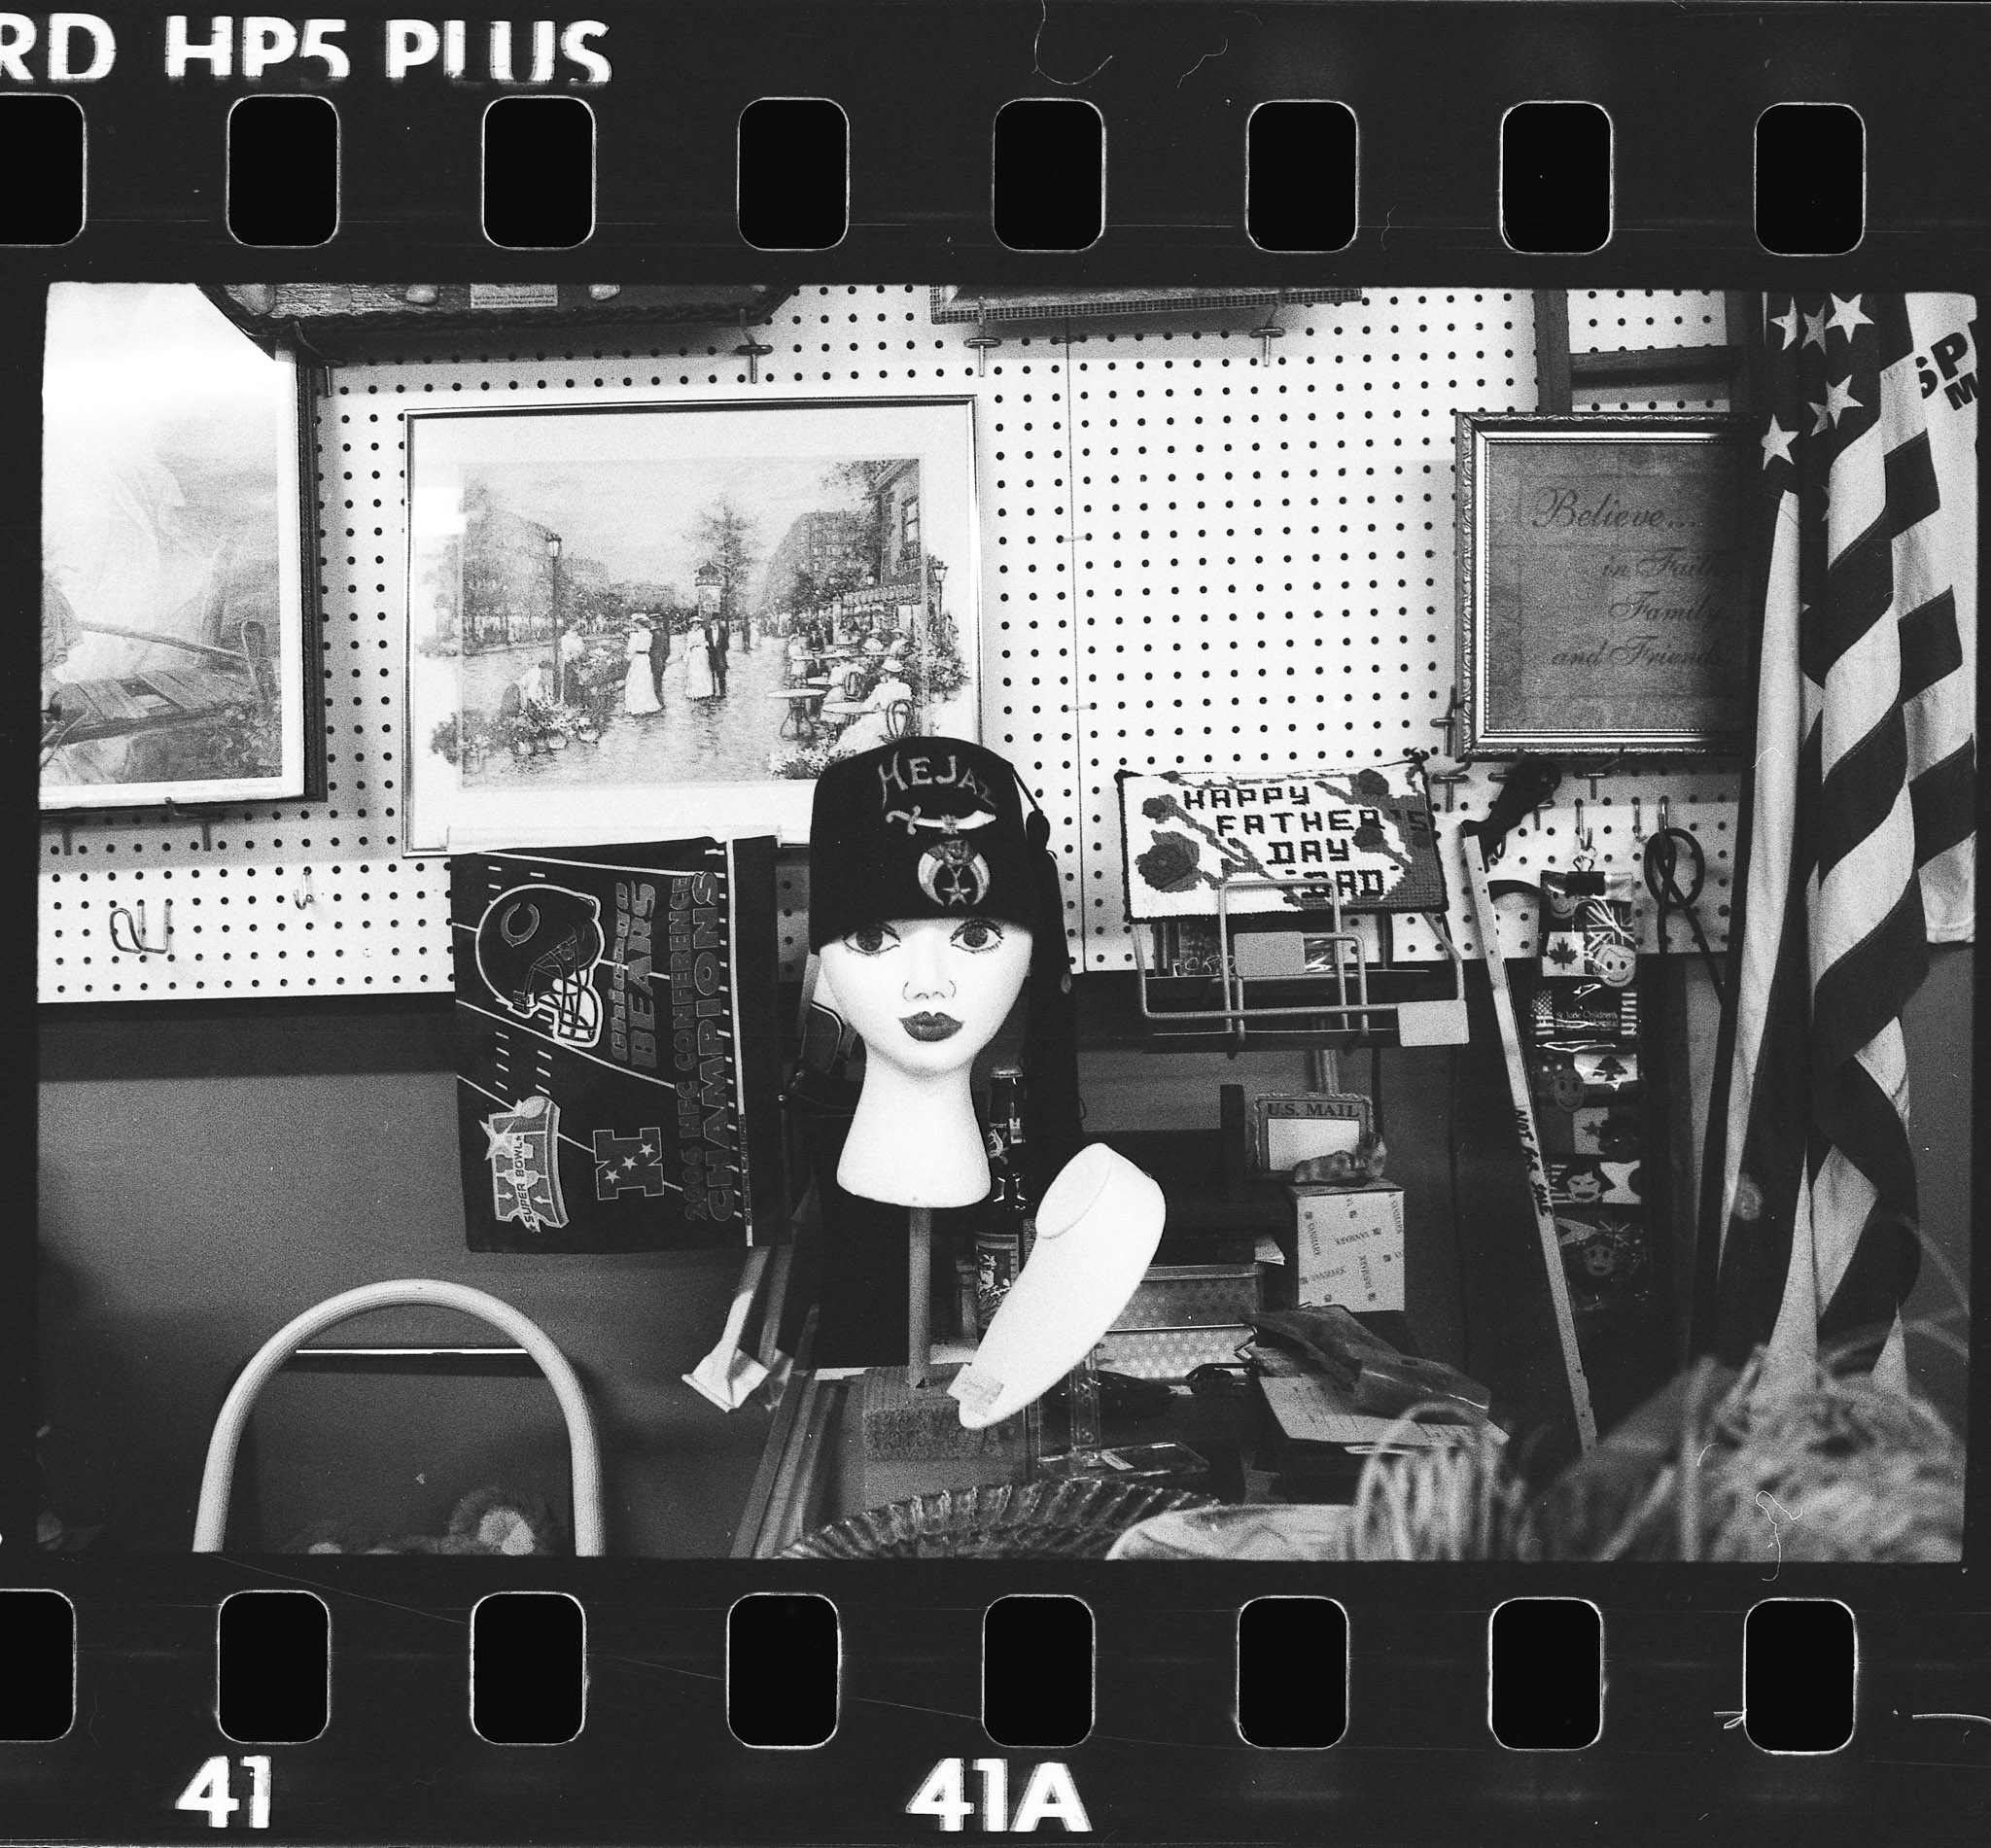 Camera:Canon QL17  Film: HP5+ rated at 1600